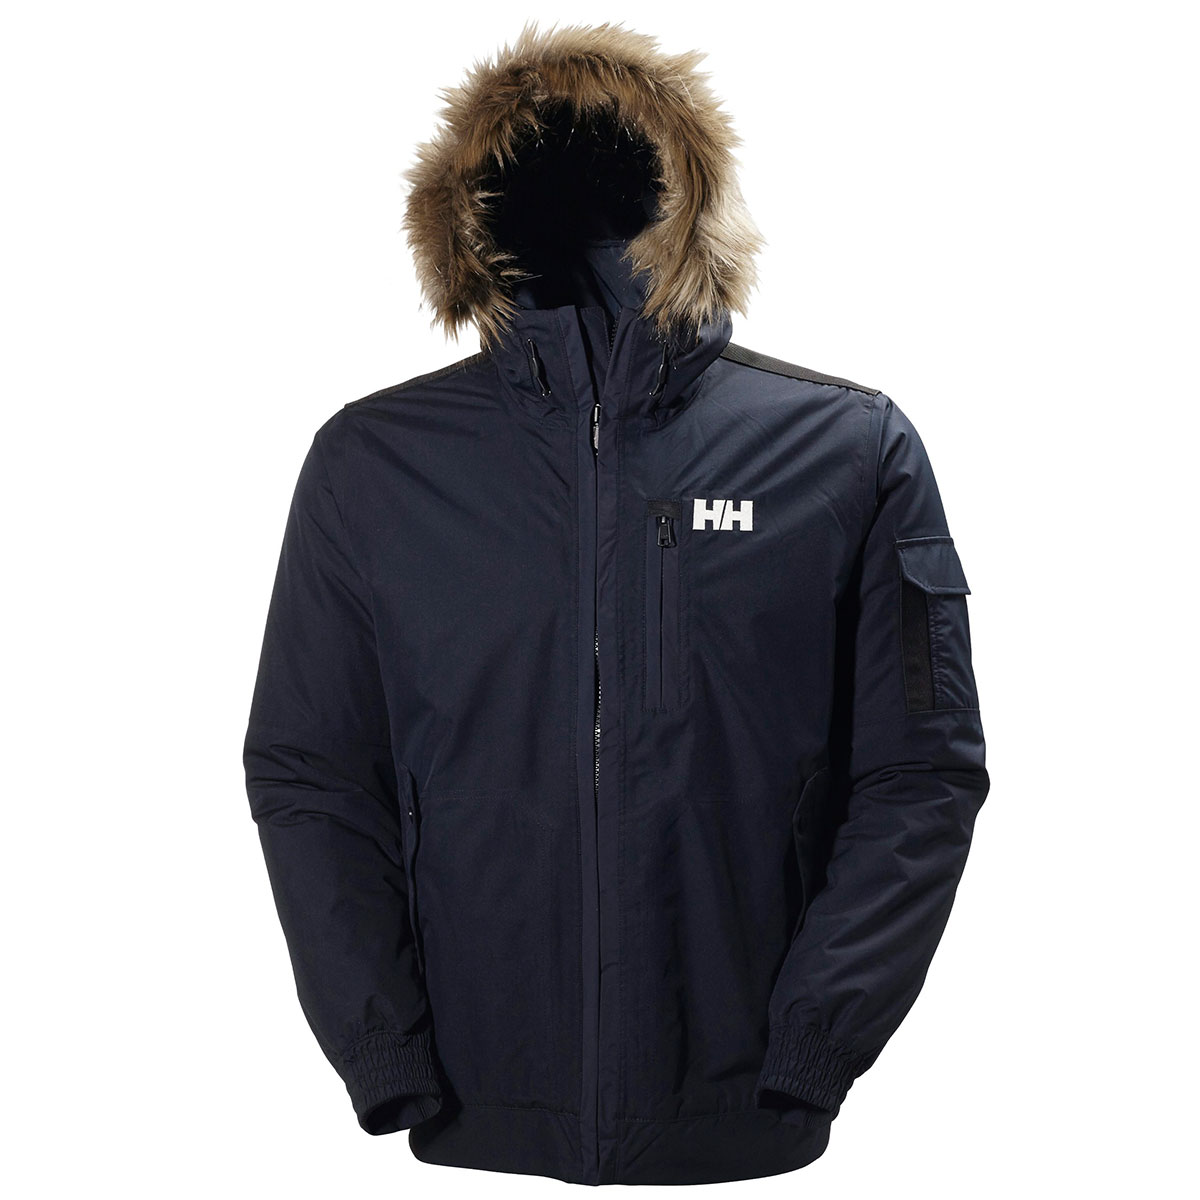 Helly Hansen 2016 Mens Dubliner Bomber Winter Outdoor Jacket Coat ...